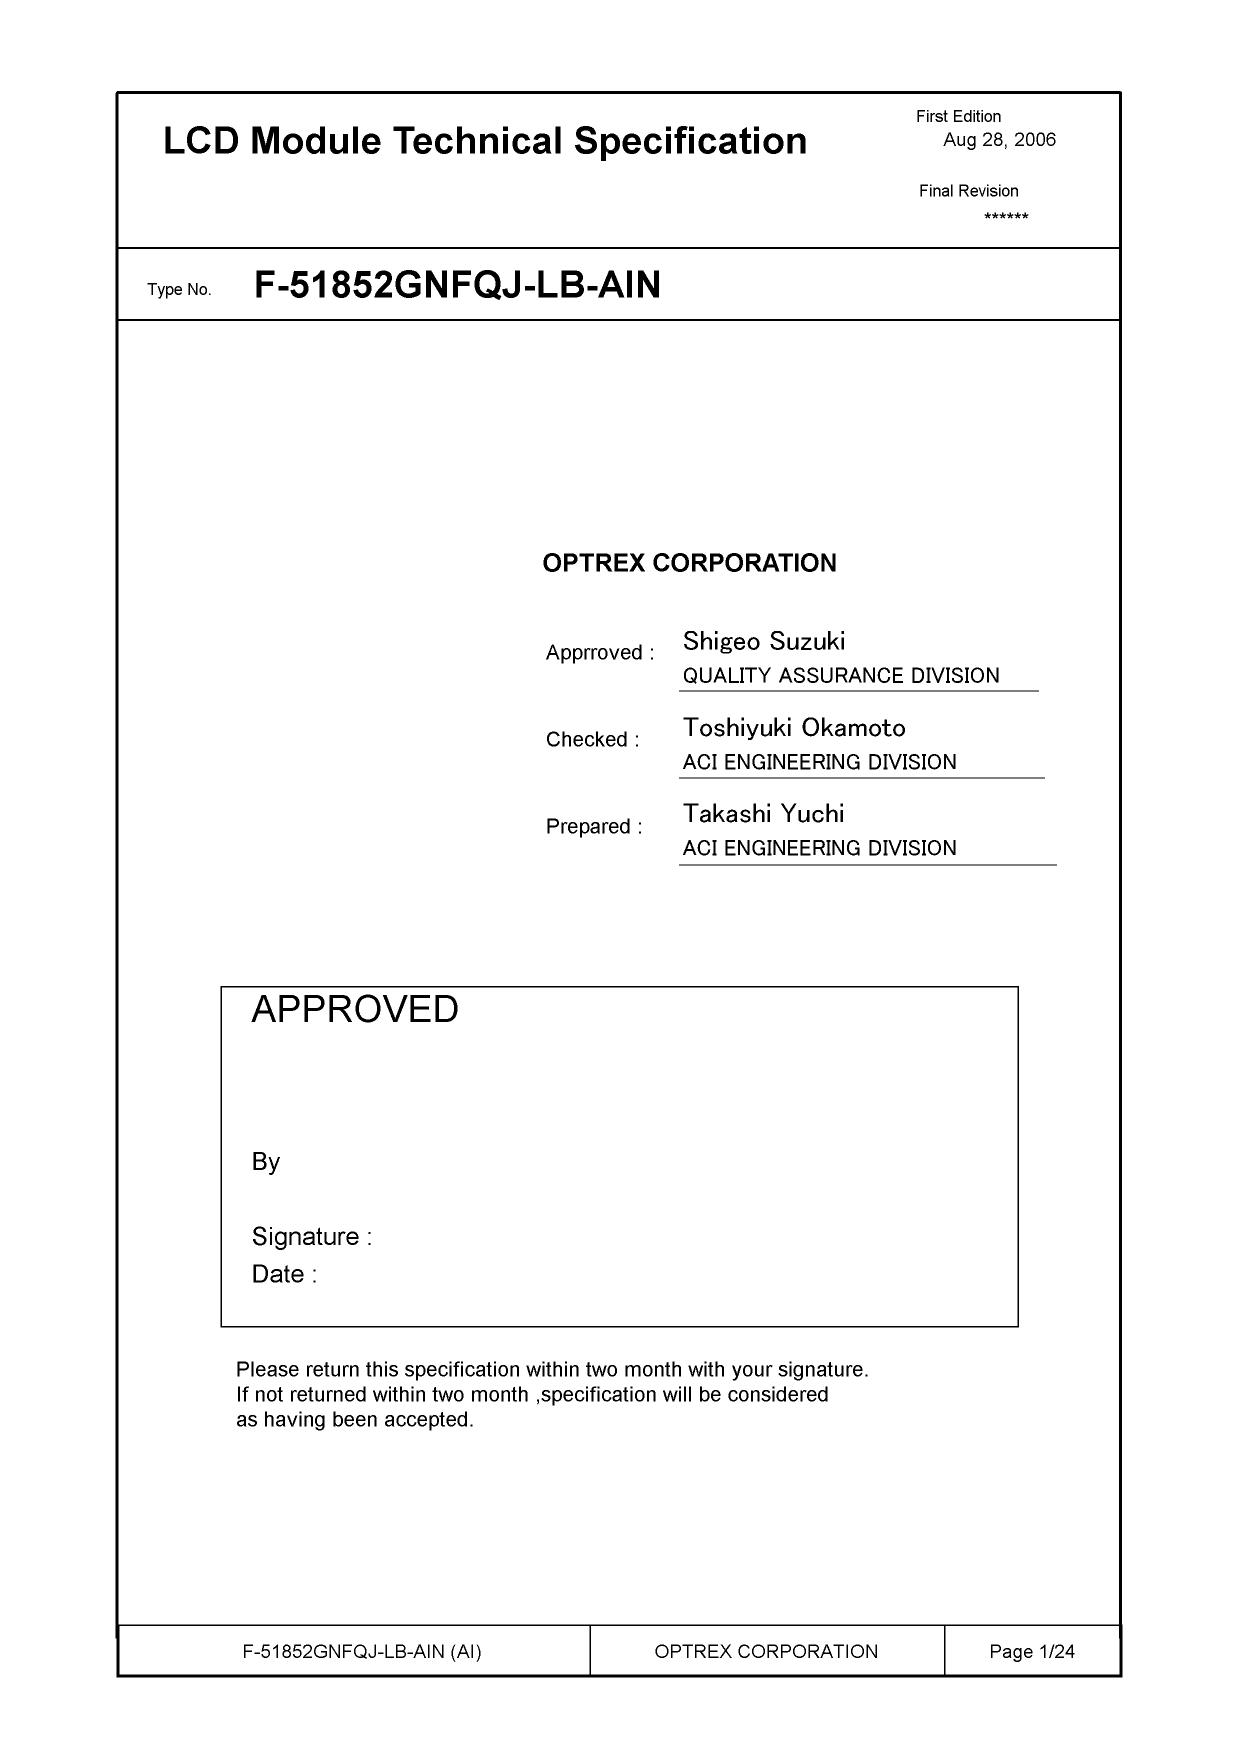 F-51852GNFQJ-LB-AIN datasheet